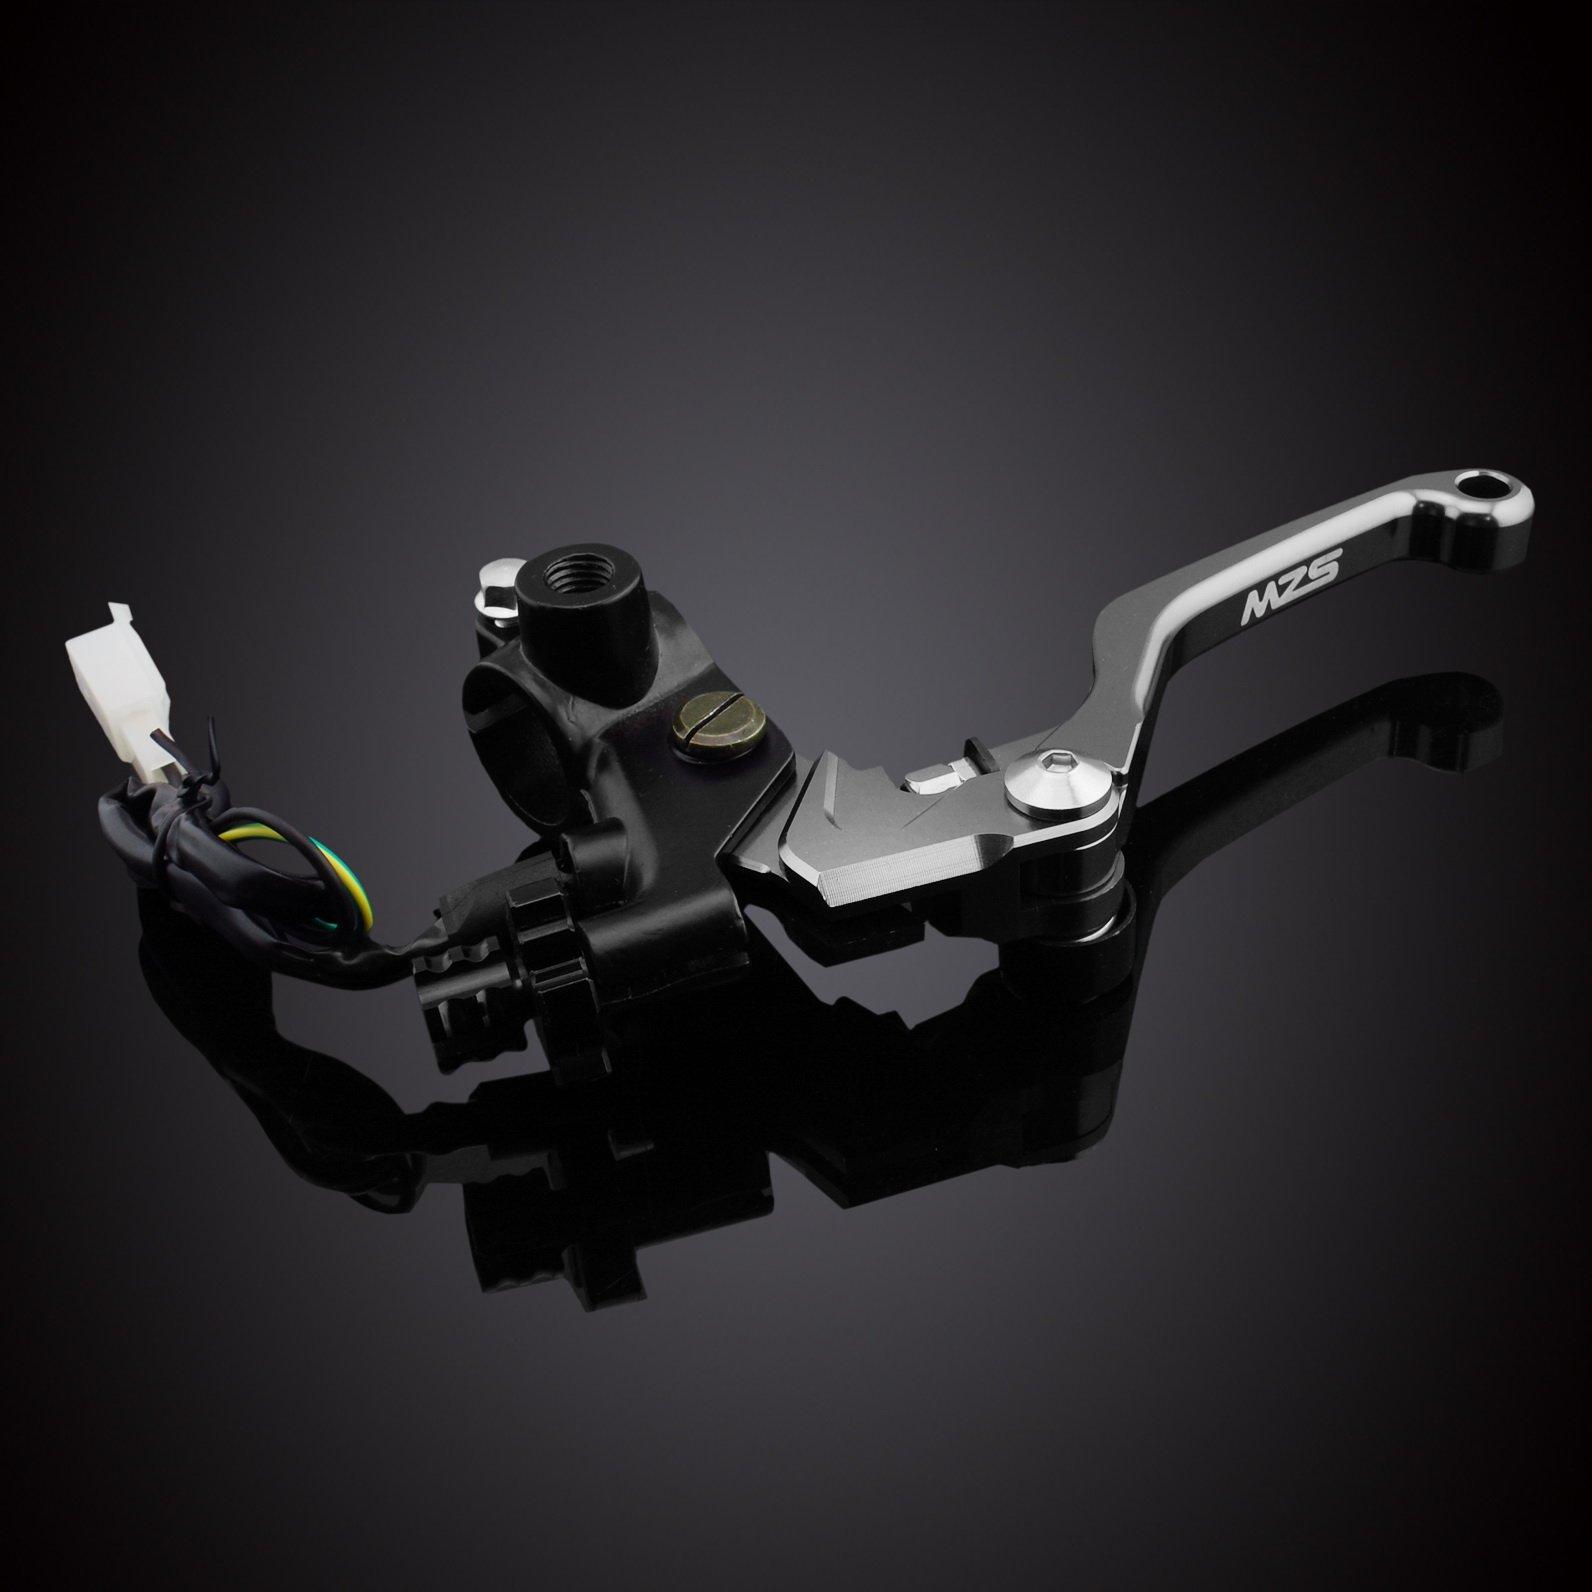 MZS 7/8 Brake Master Cylinder Reservoir Pivot Levers Set for Honda Yamaha Suzuki Kawasaki KTM (Gray) by MZS (Image #4)